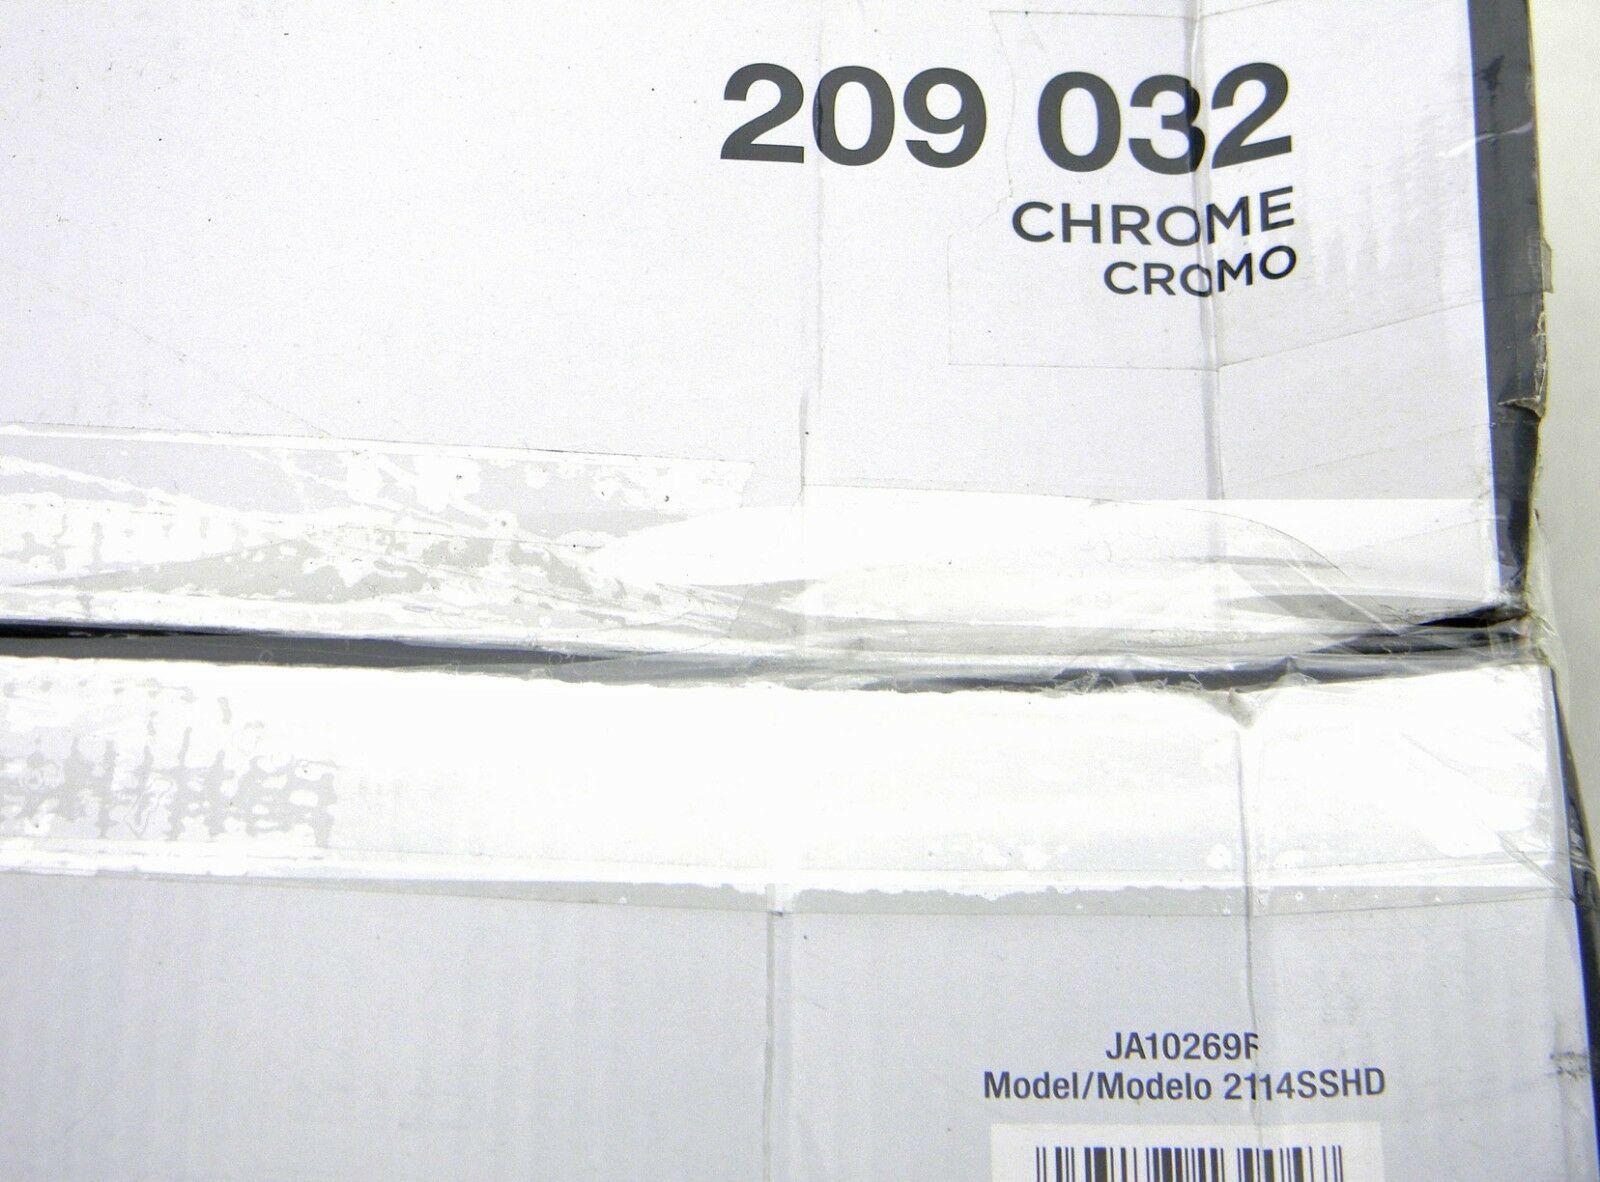 New Glacier Bay 2114SSHD Tension-Mount 4 Shelf Pole Shower Caddy 209032 Chrome